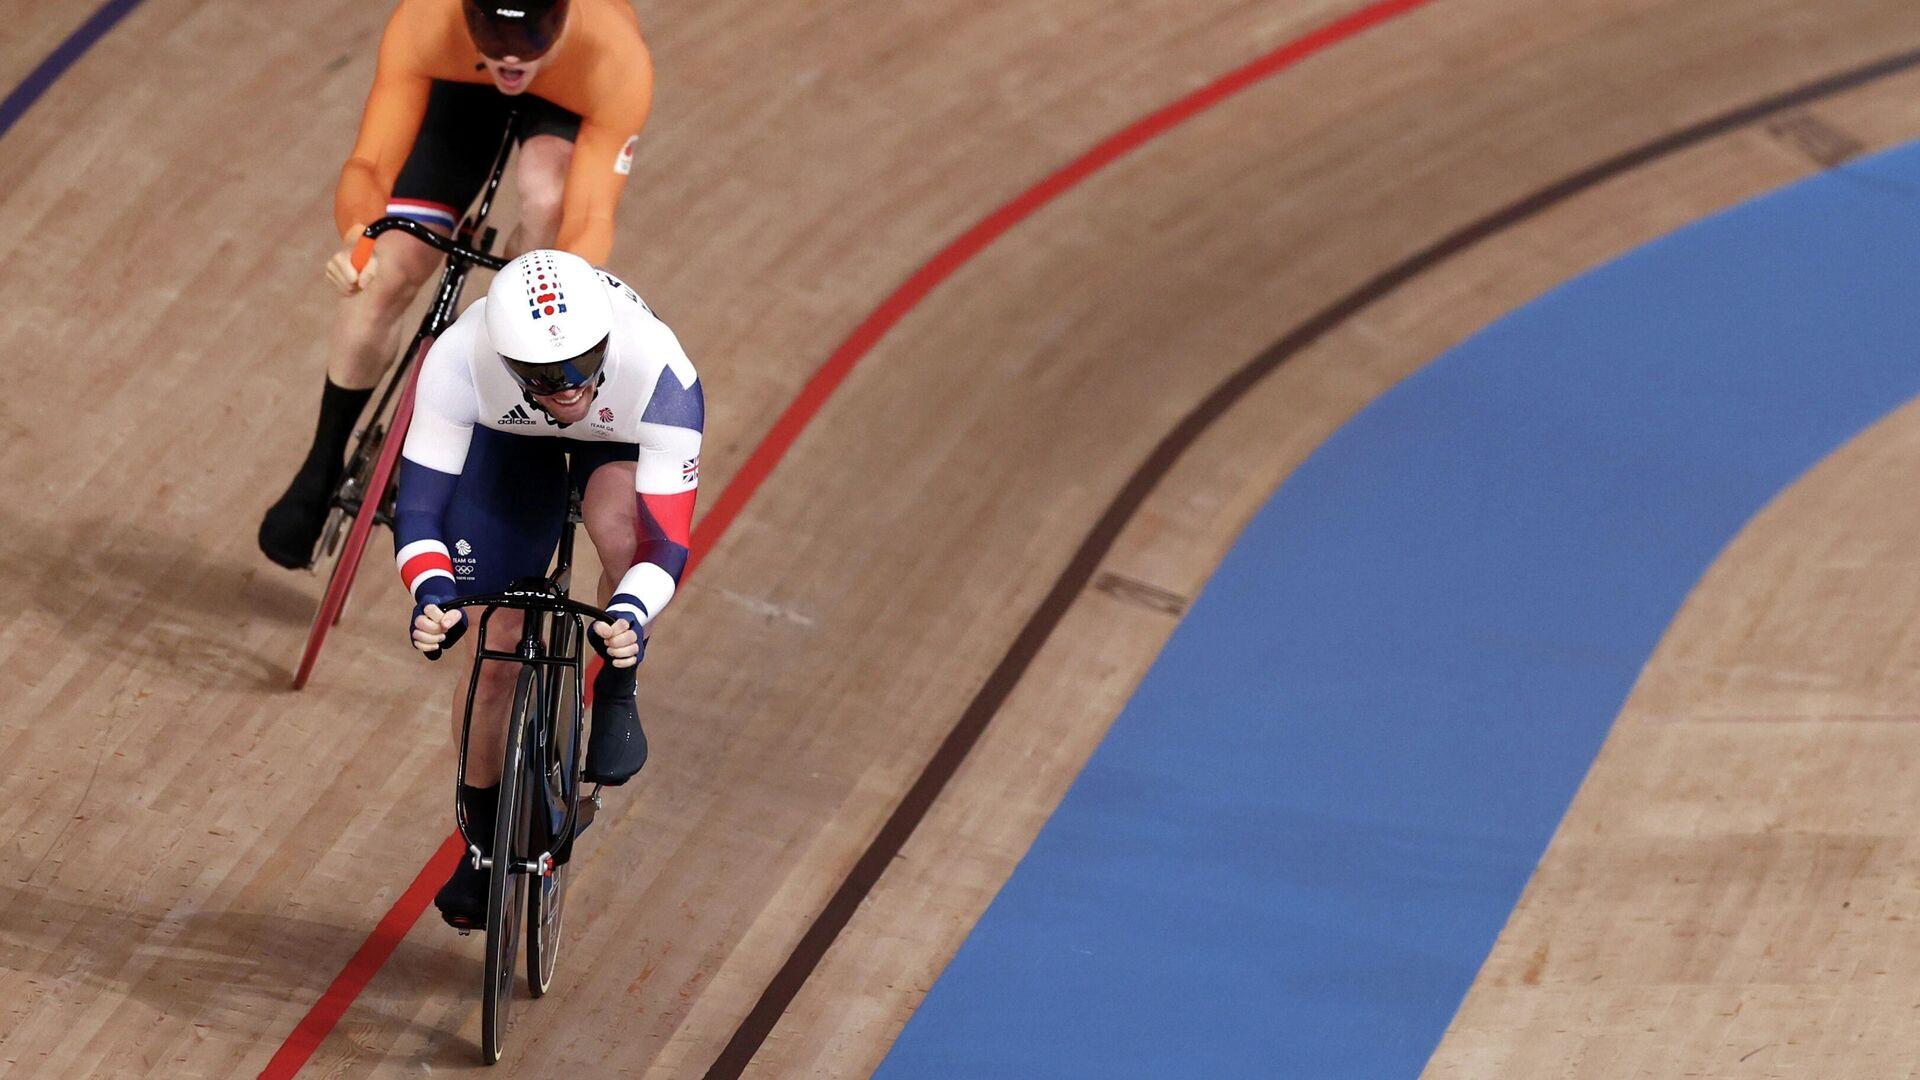 Британский велогонщик Джейсон Кенни на Олимпиаде в Токио - РИА Новости, 1920, 05.08.2021